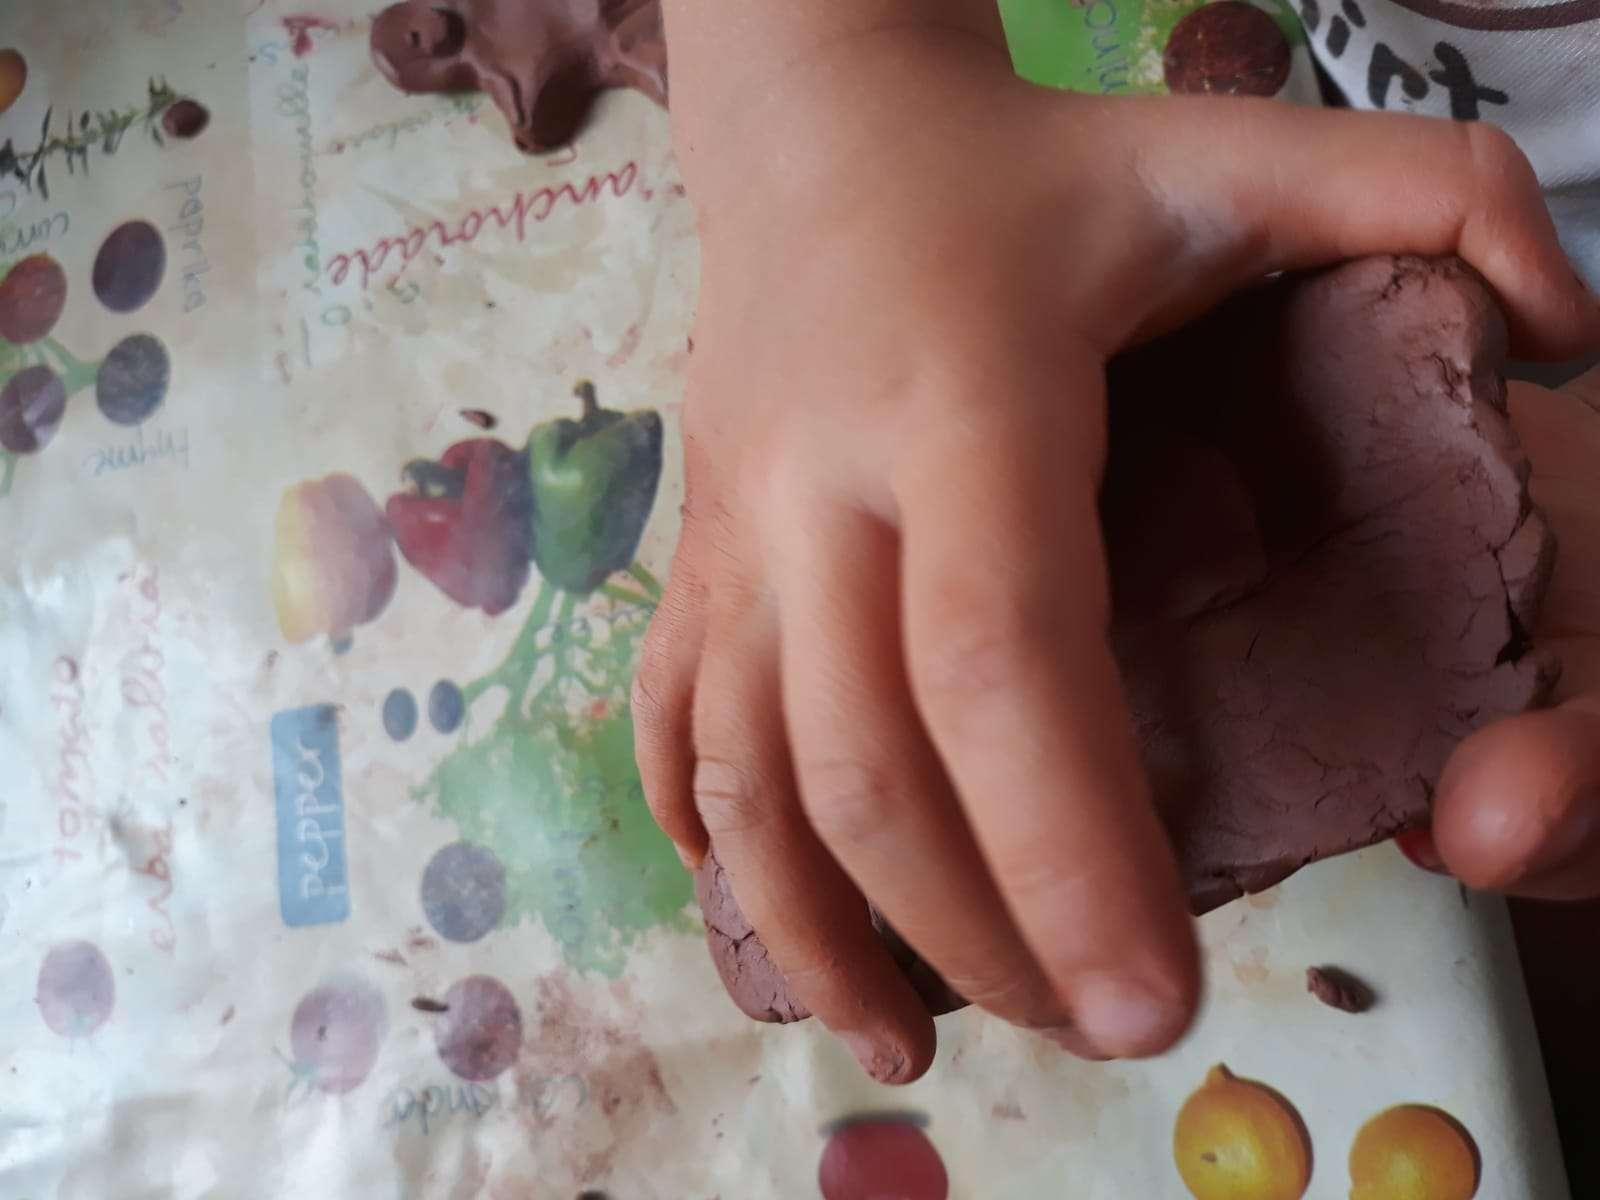 IMG 20190803 WA0019 - Scuola Materna Peschiera Borromeo